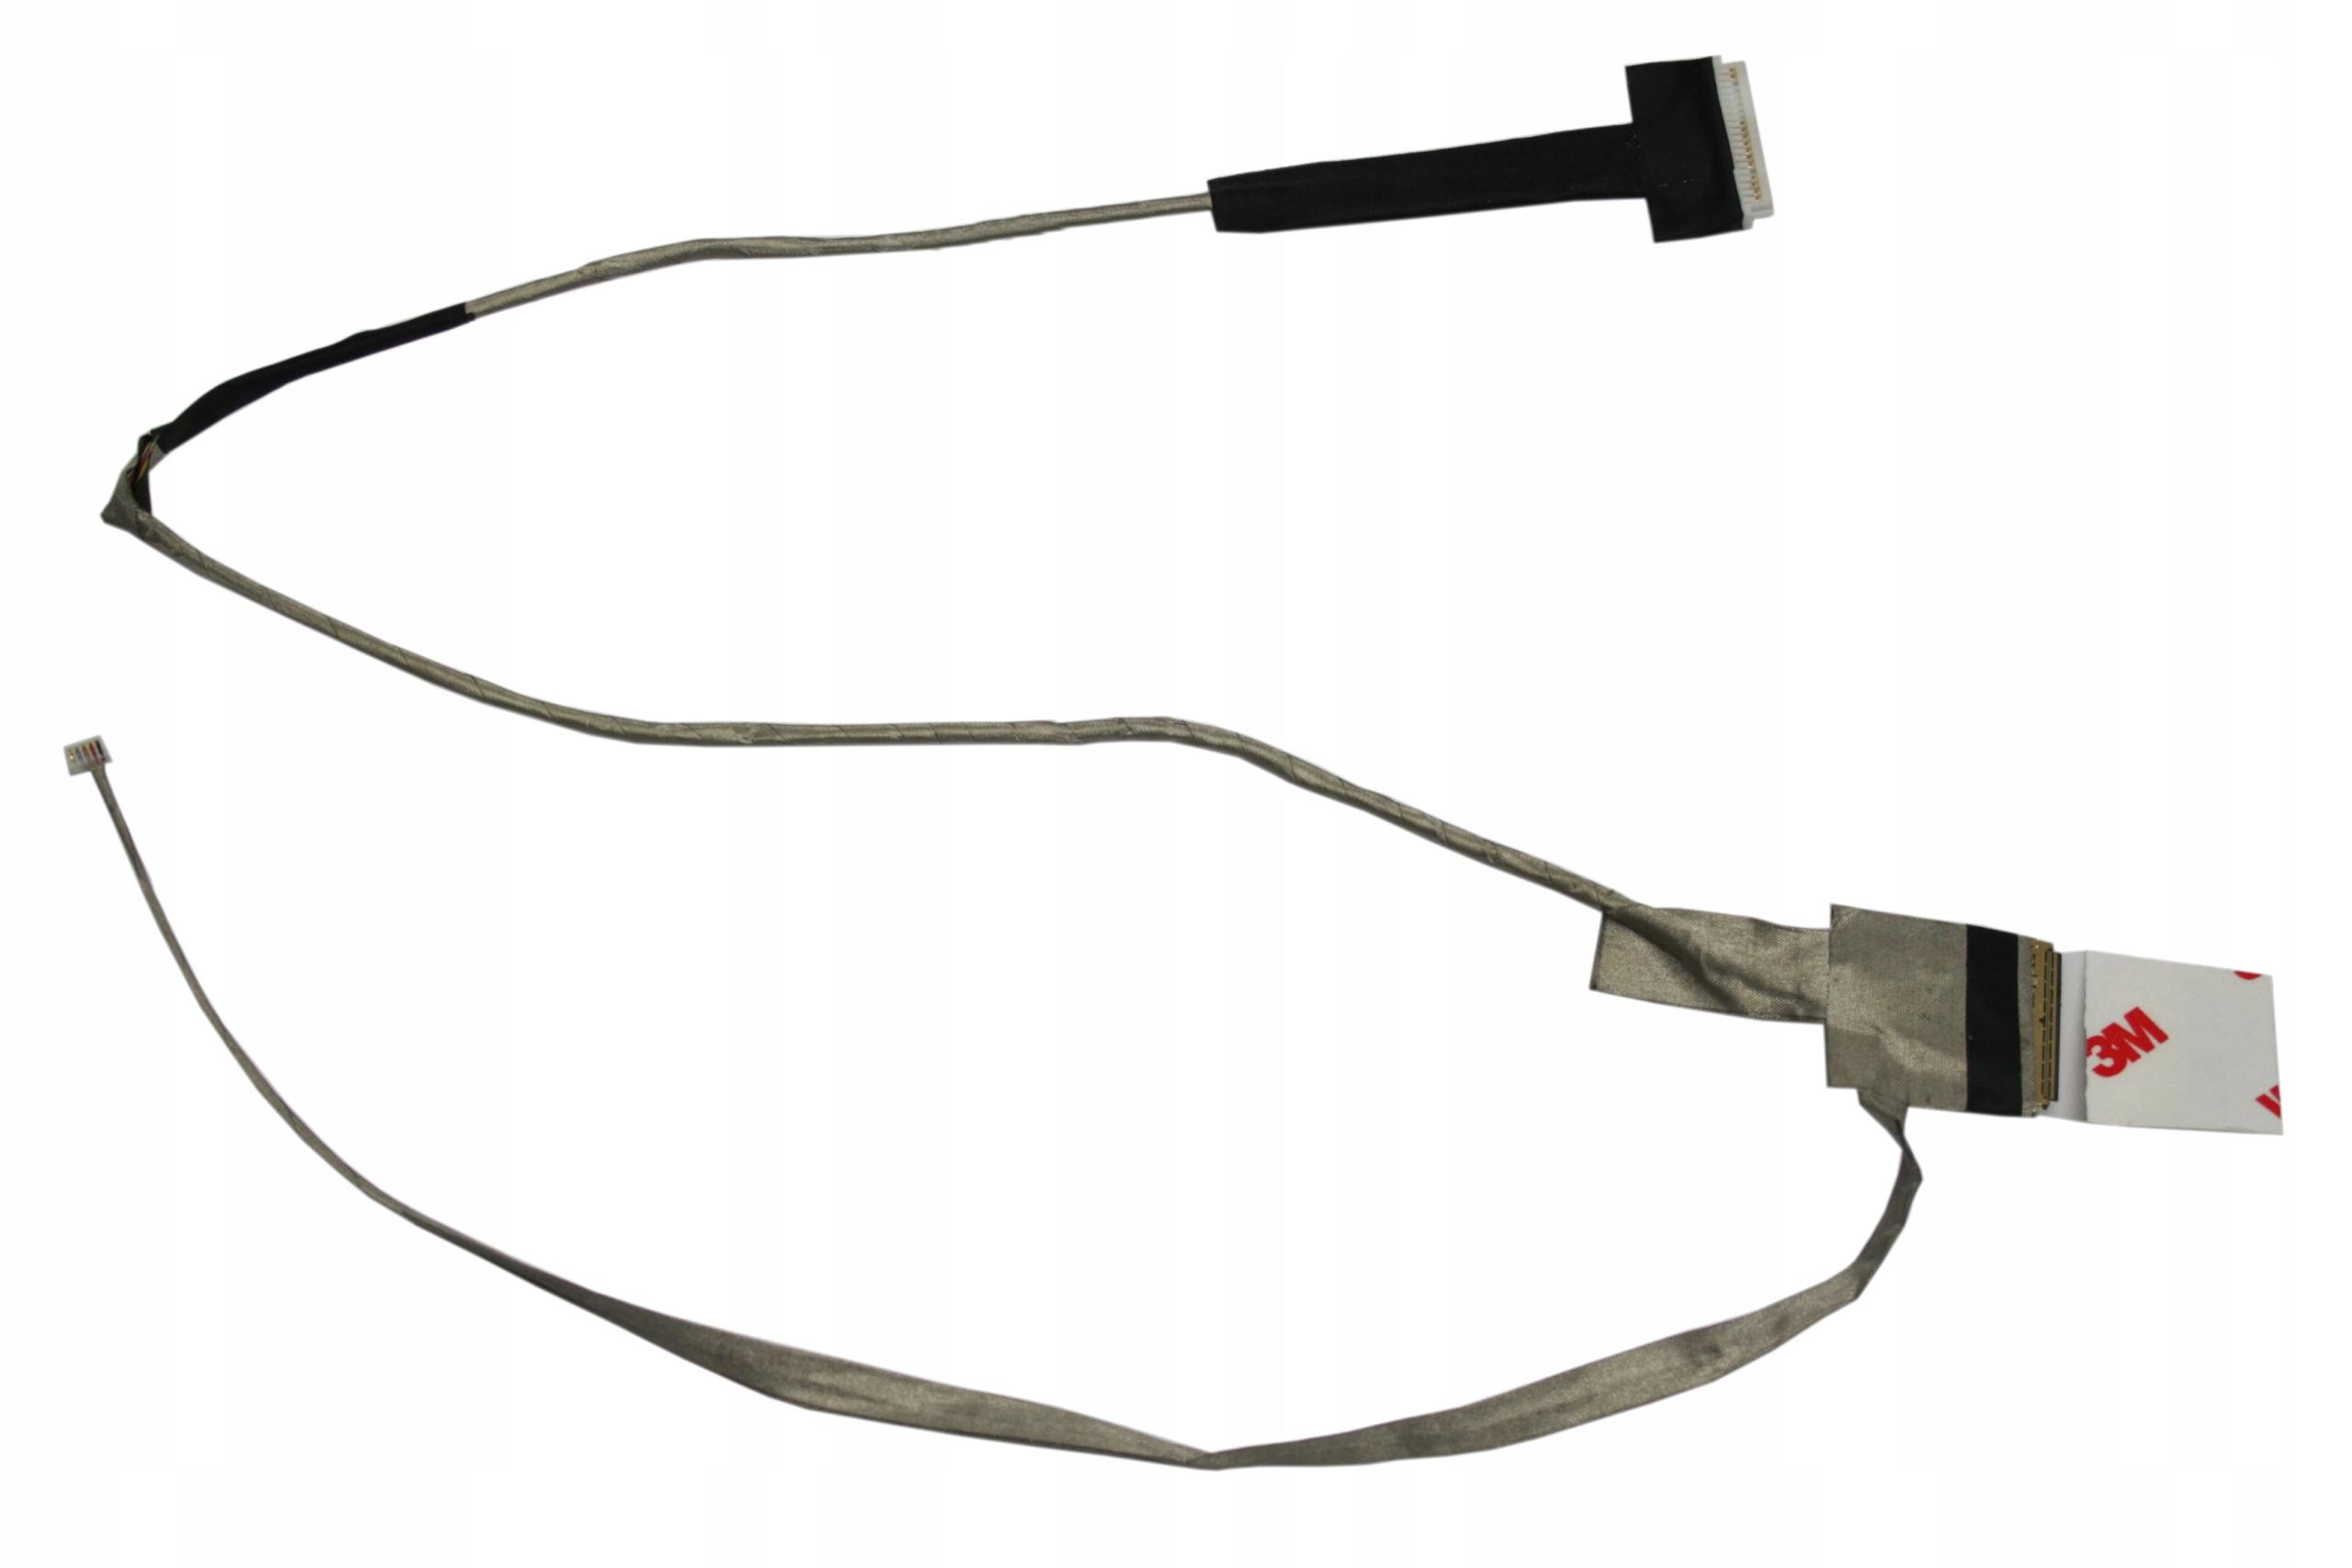 TAŚMA LCD MATRYCY TOSHIBA SATELLITE L500D L505D DC02000UC10 - Taśmy i inwertery